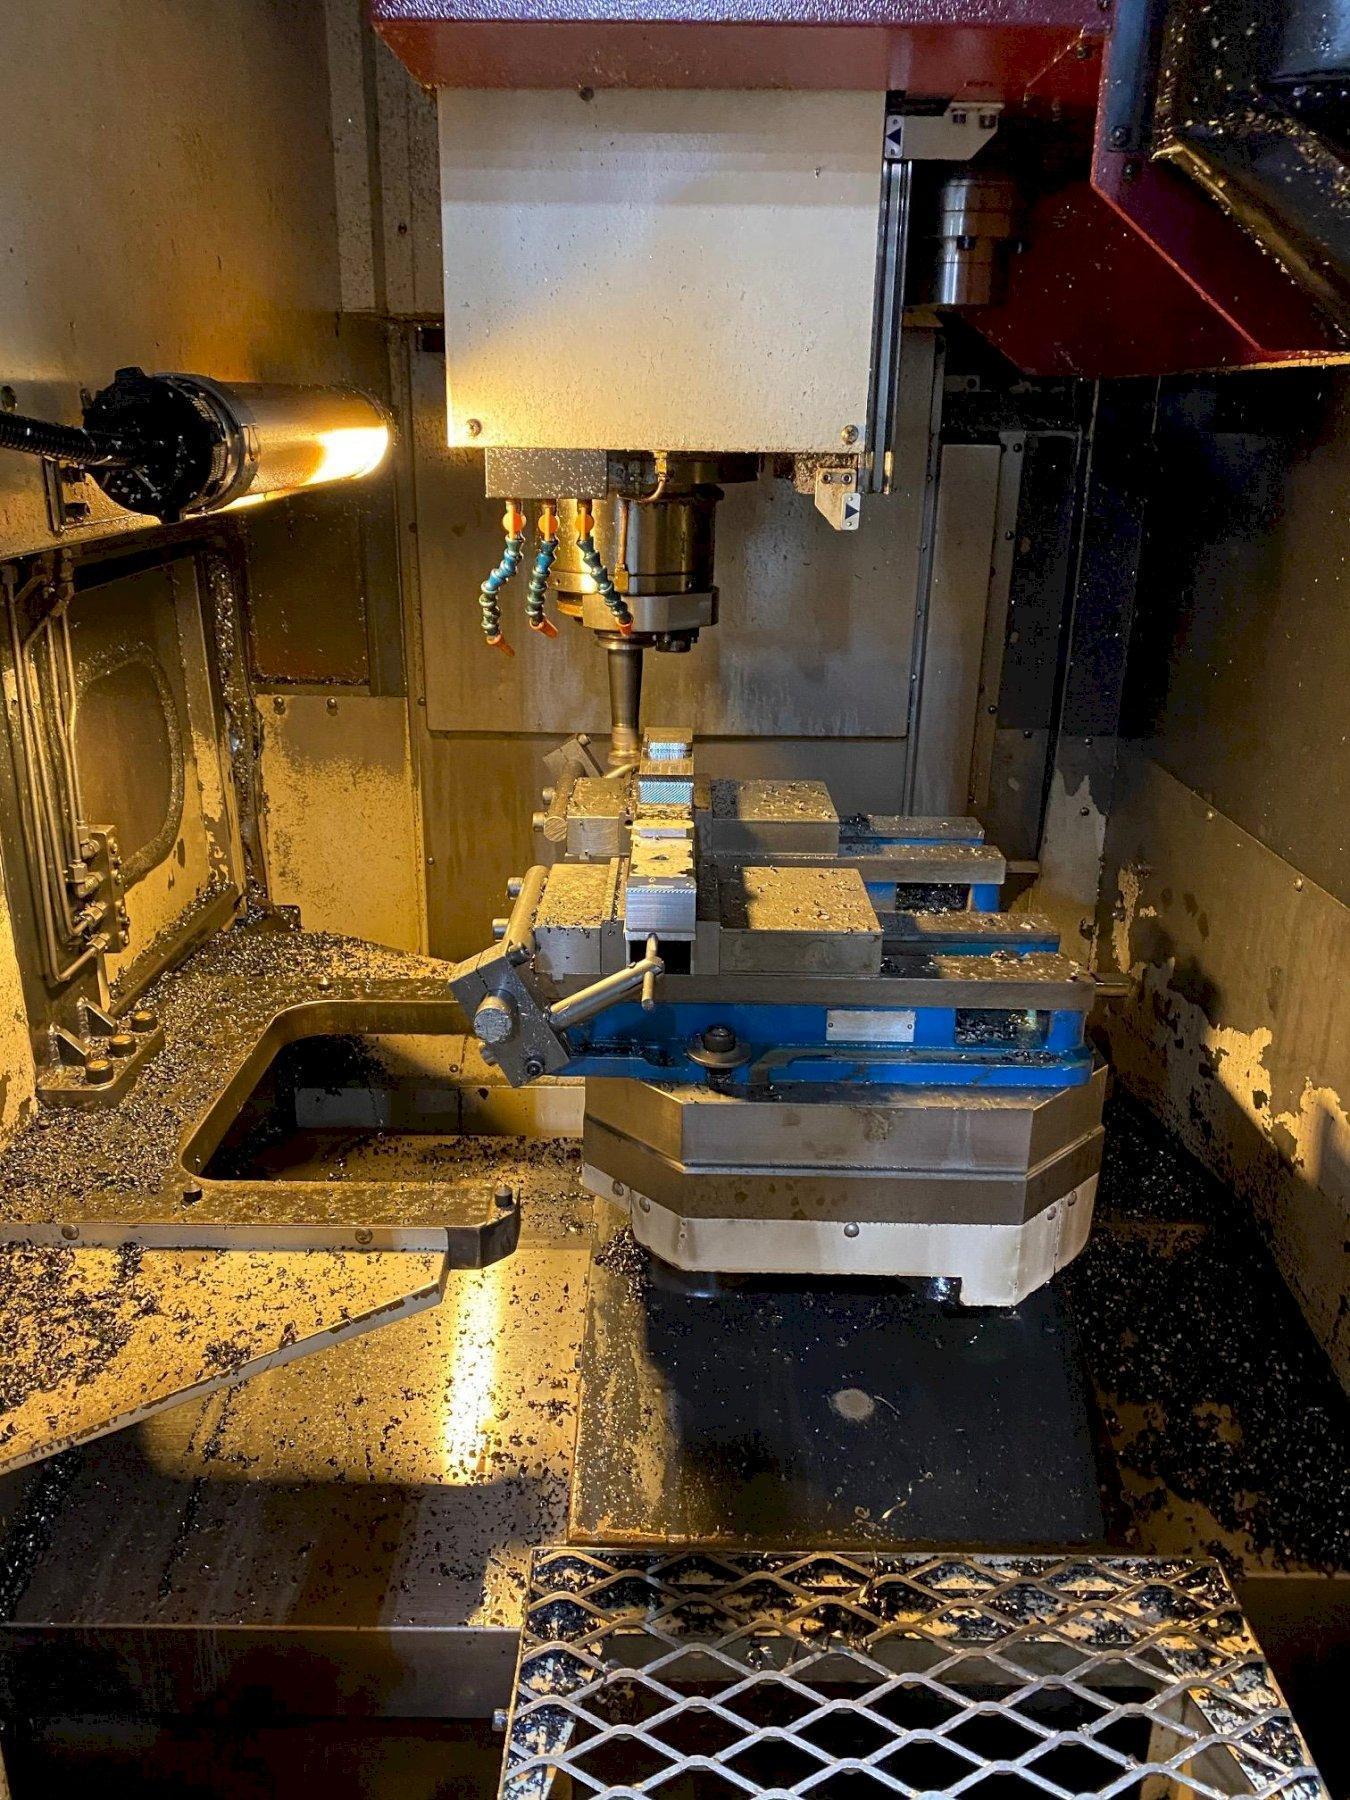 OKK VP400 CNC Vertical Pallet Changing Machining Center